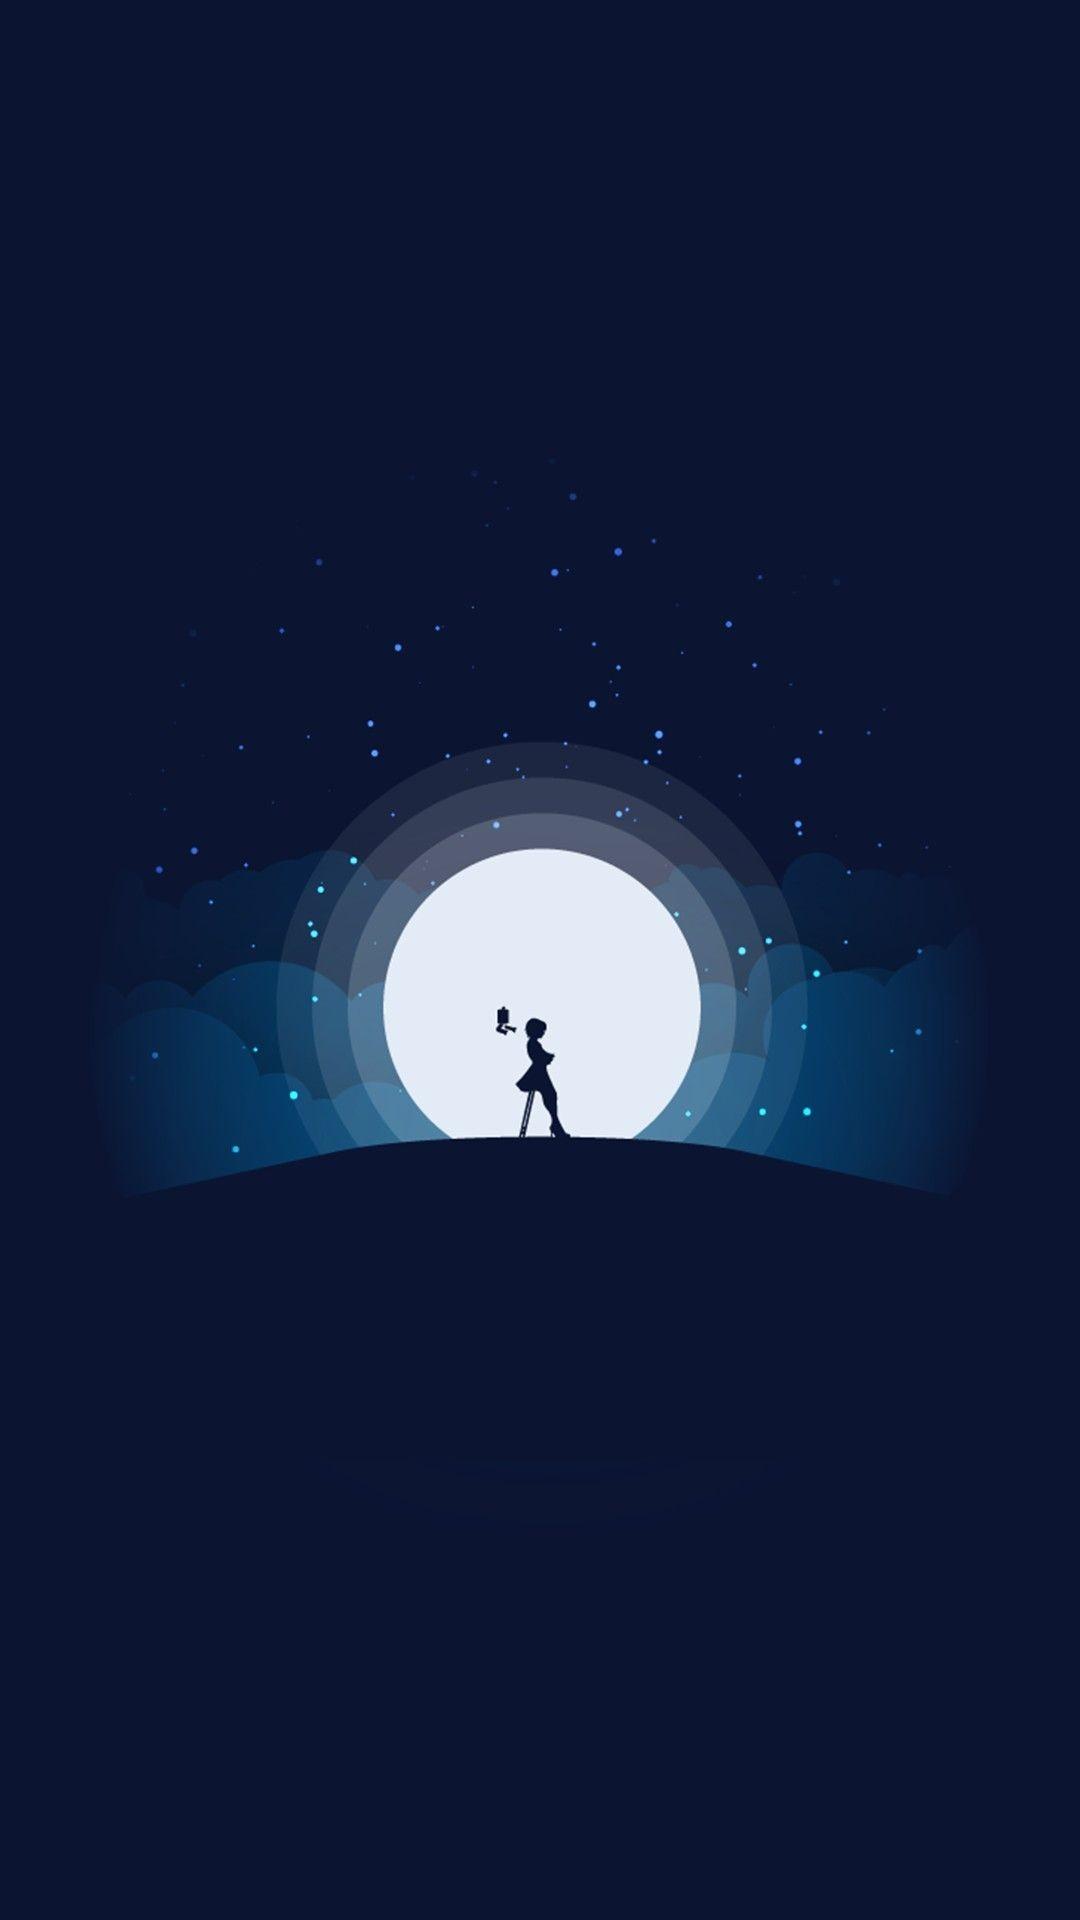 Iphone Wallpaper Moon, Black Wallpaper, Lock Screen   Darkness ...